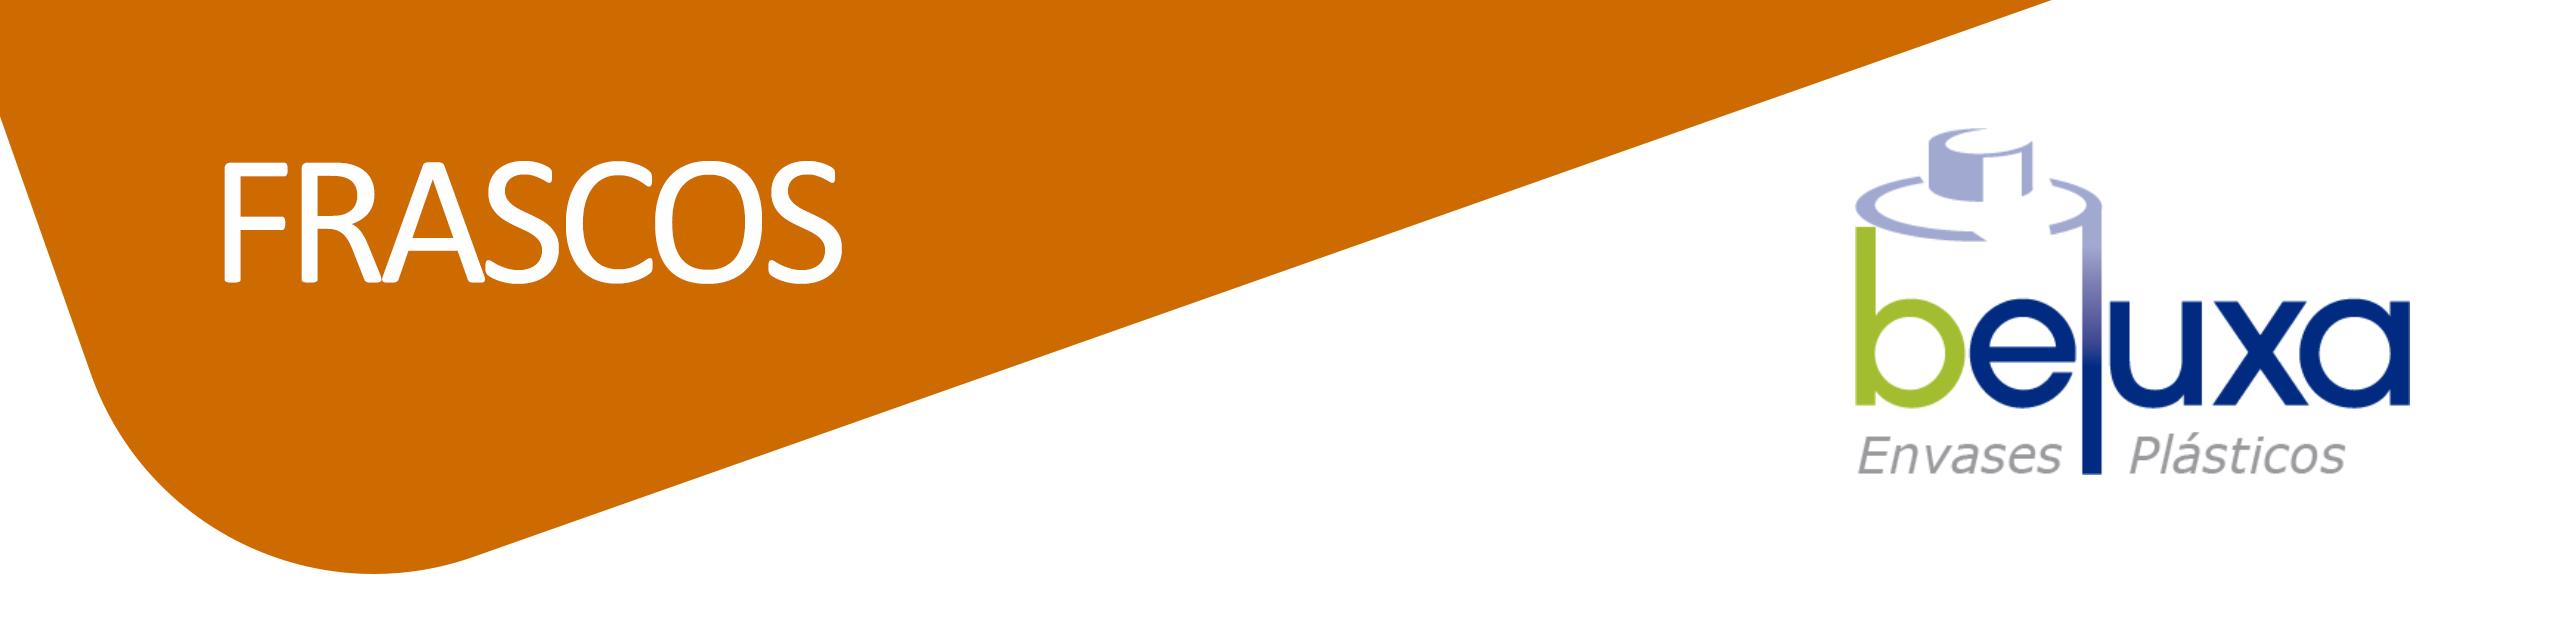 BANNER -BELUXA-CATEGORIAS-FRASCOS